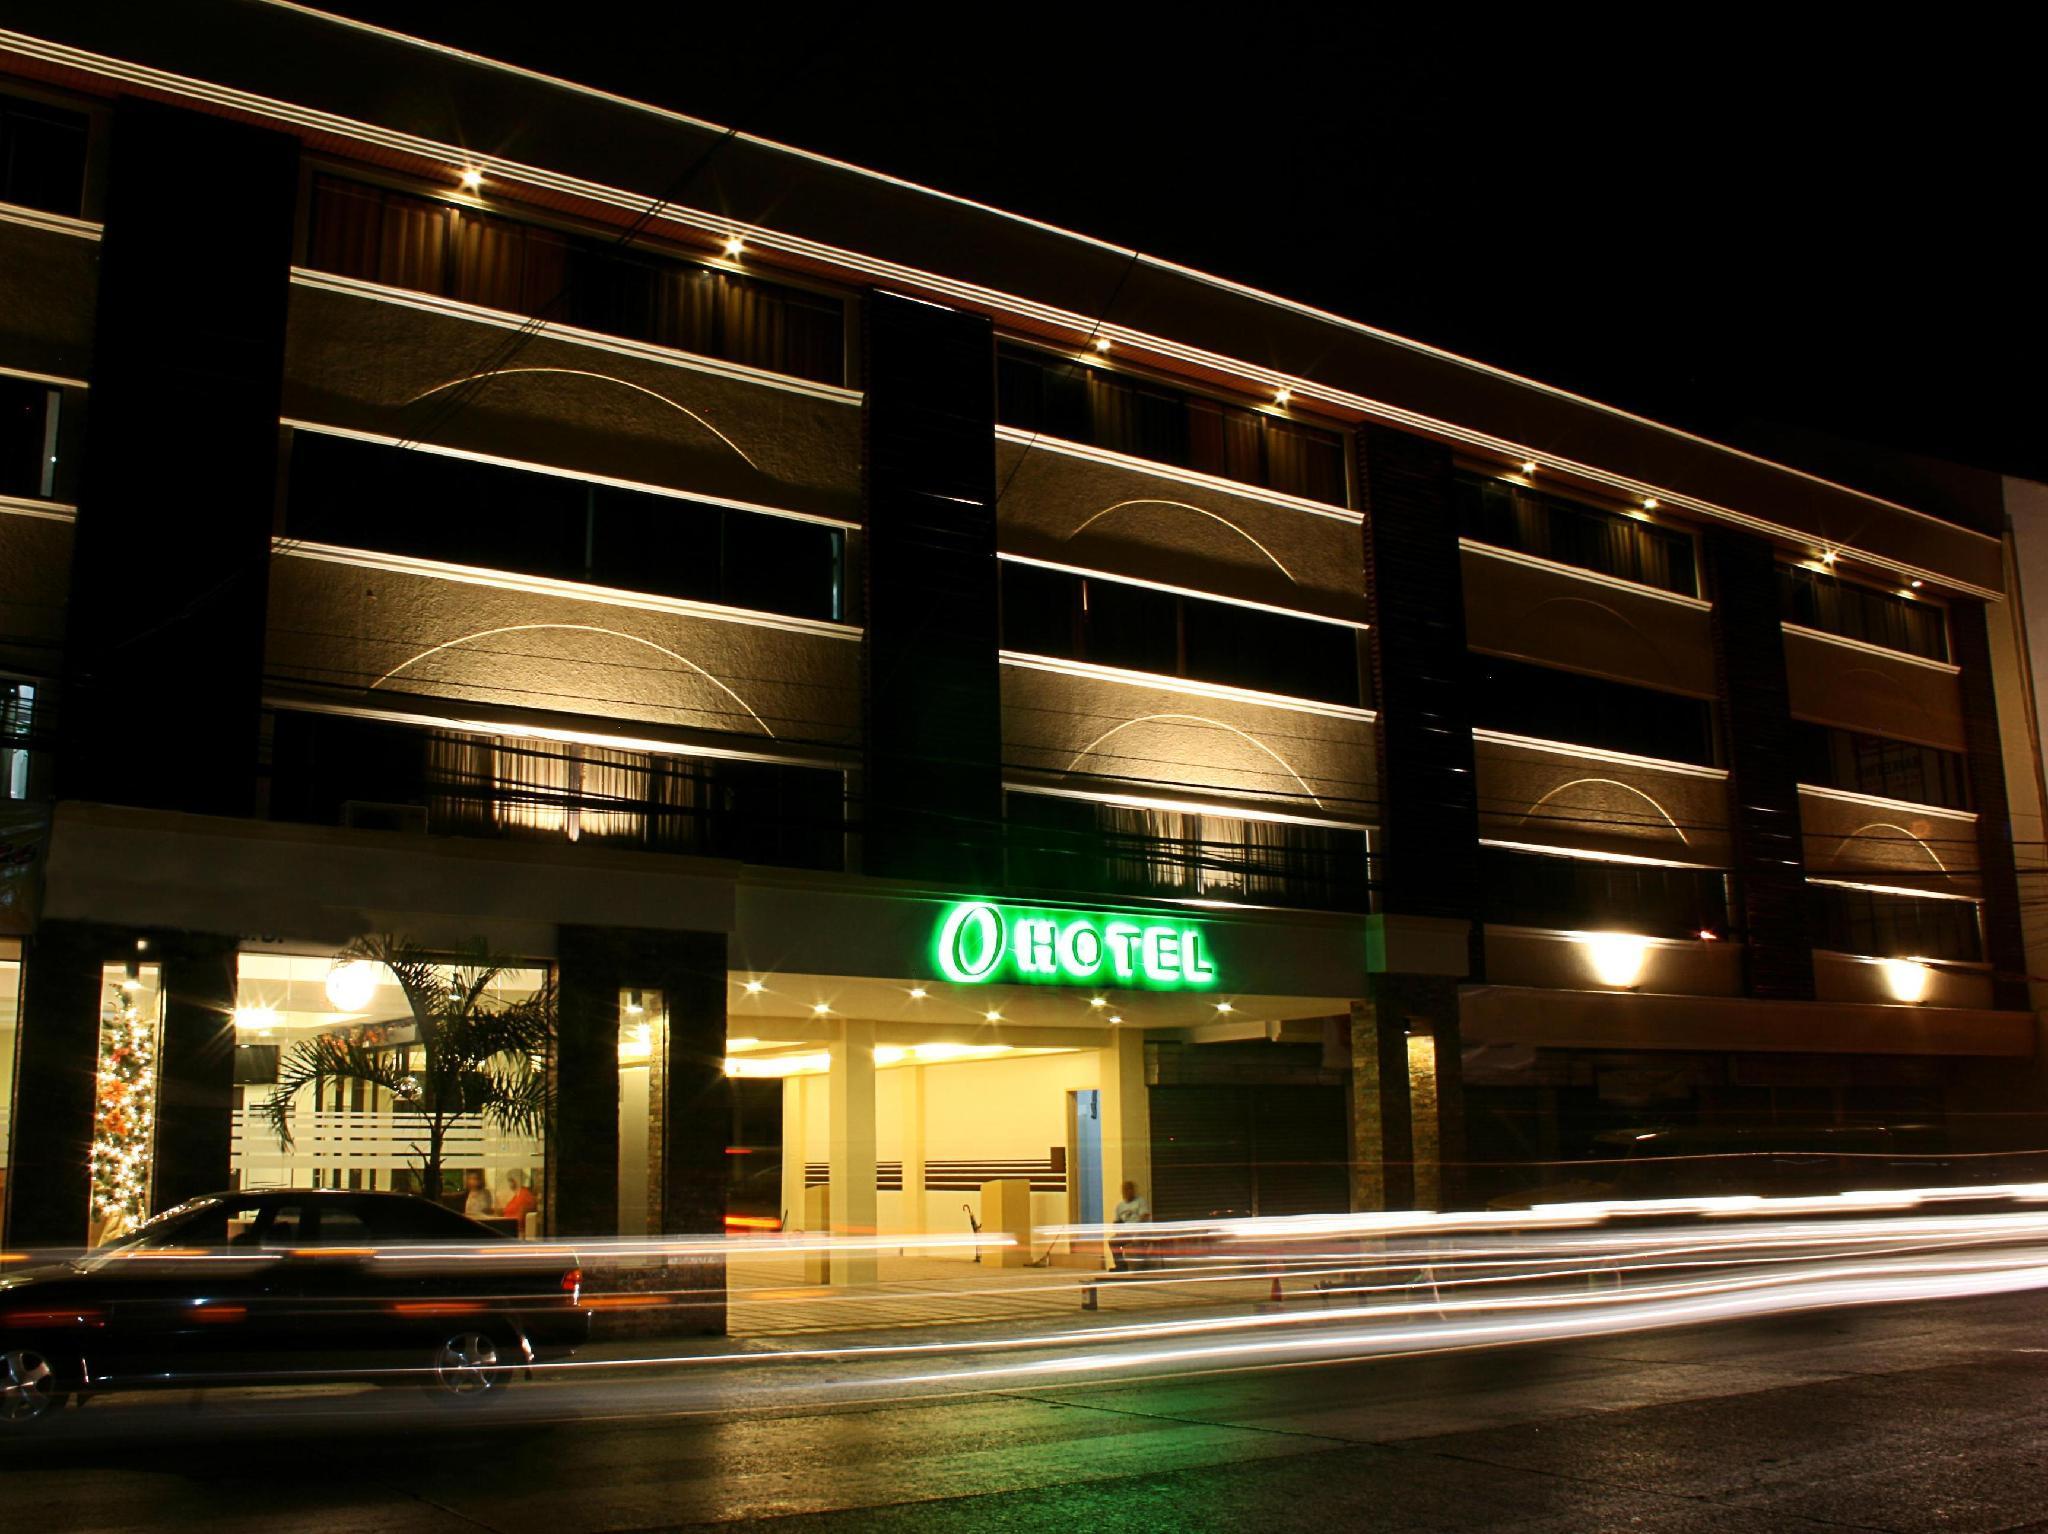 O Hotel Bacolod (Negros Occidental)